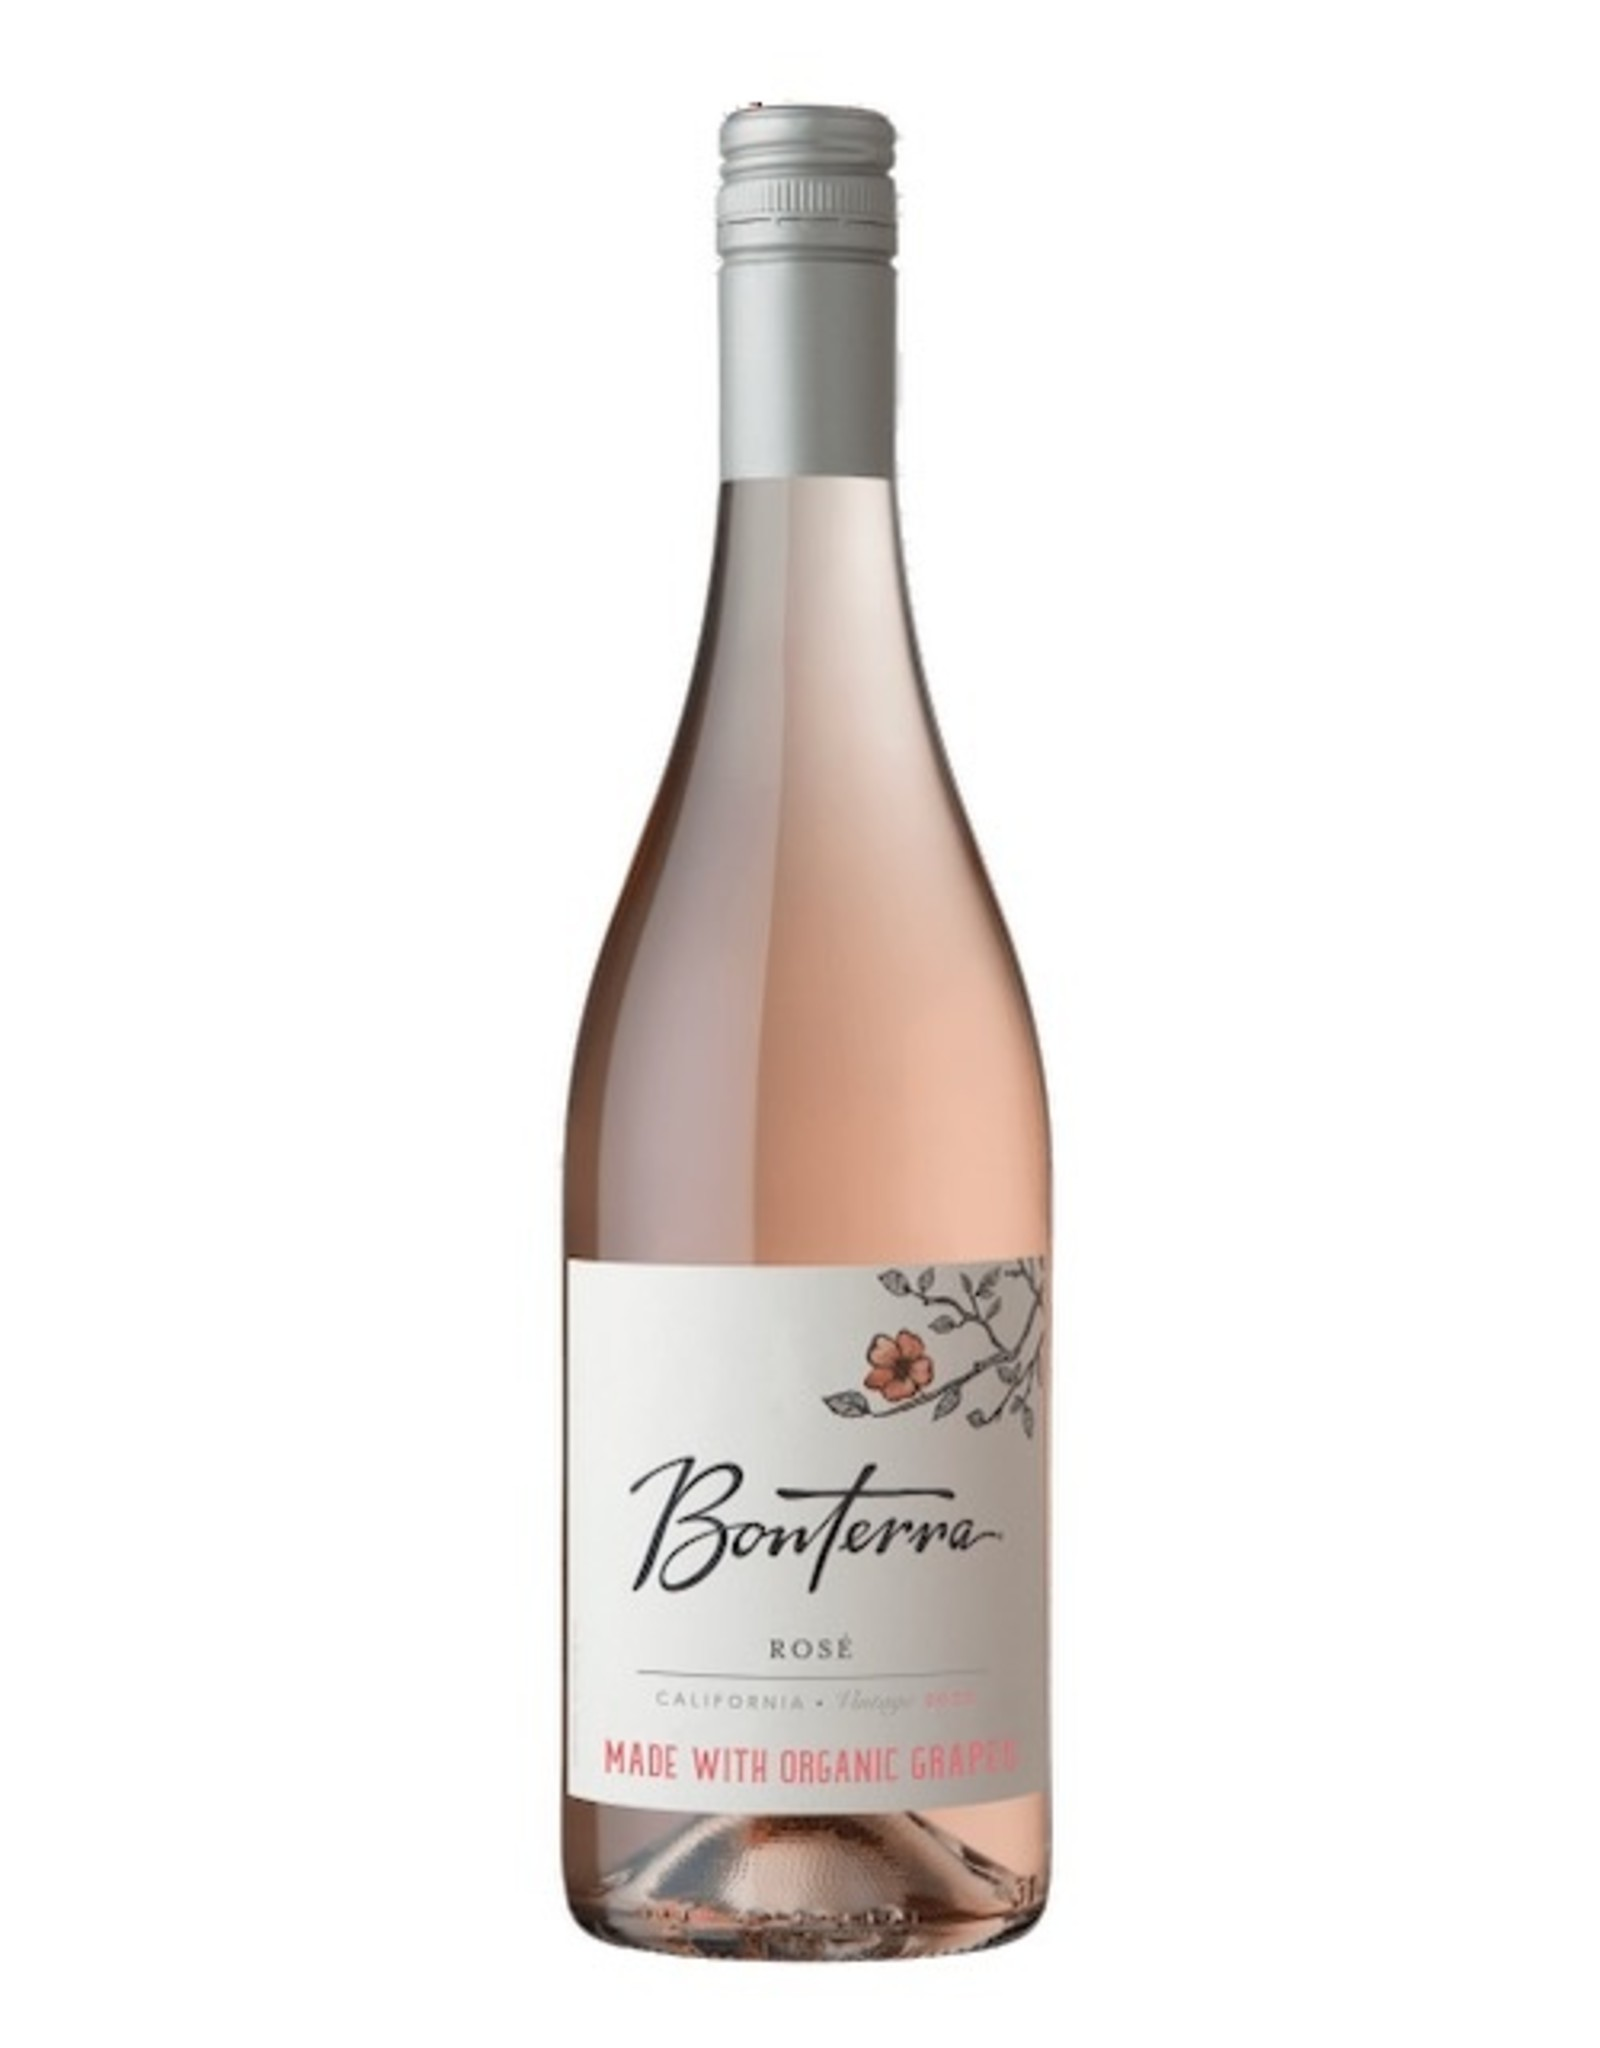 Bonterra California Rose 2020